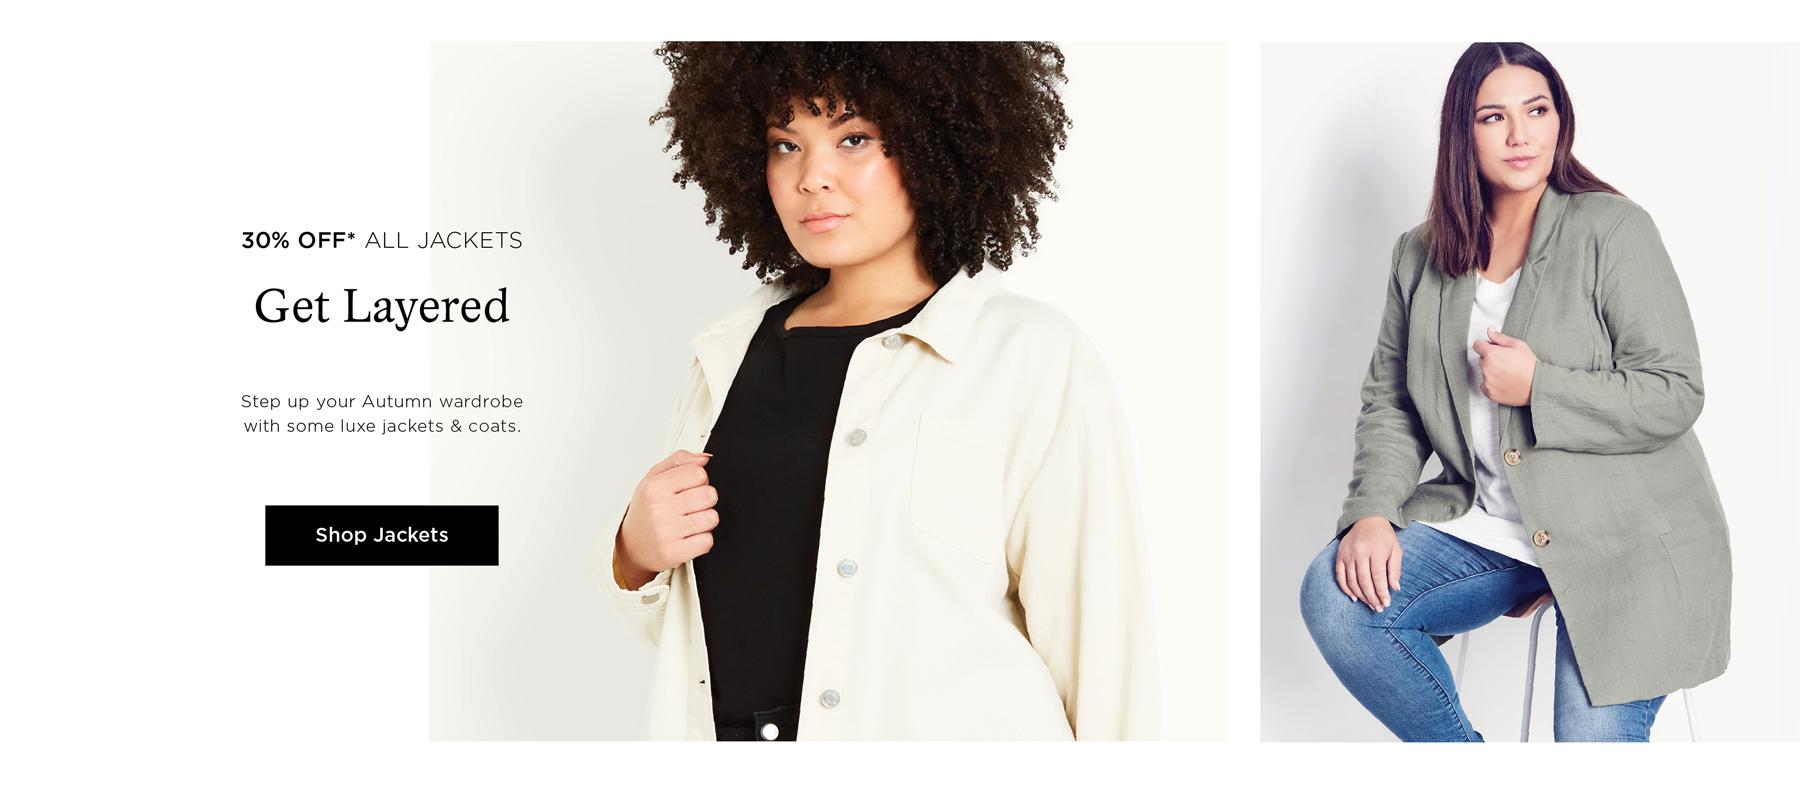 Autumn Essentials - Shop 30% Off* Jackets